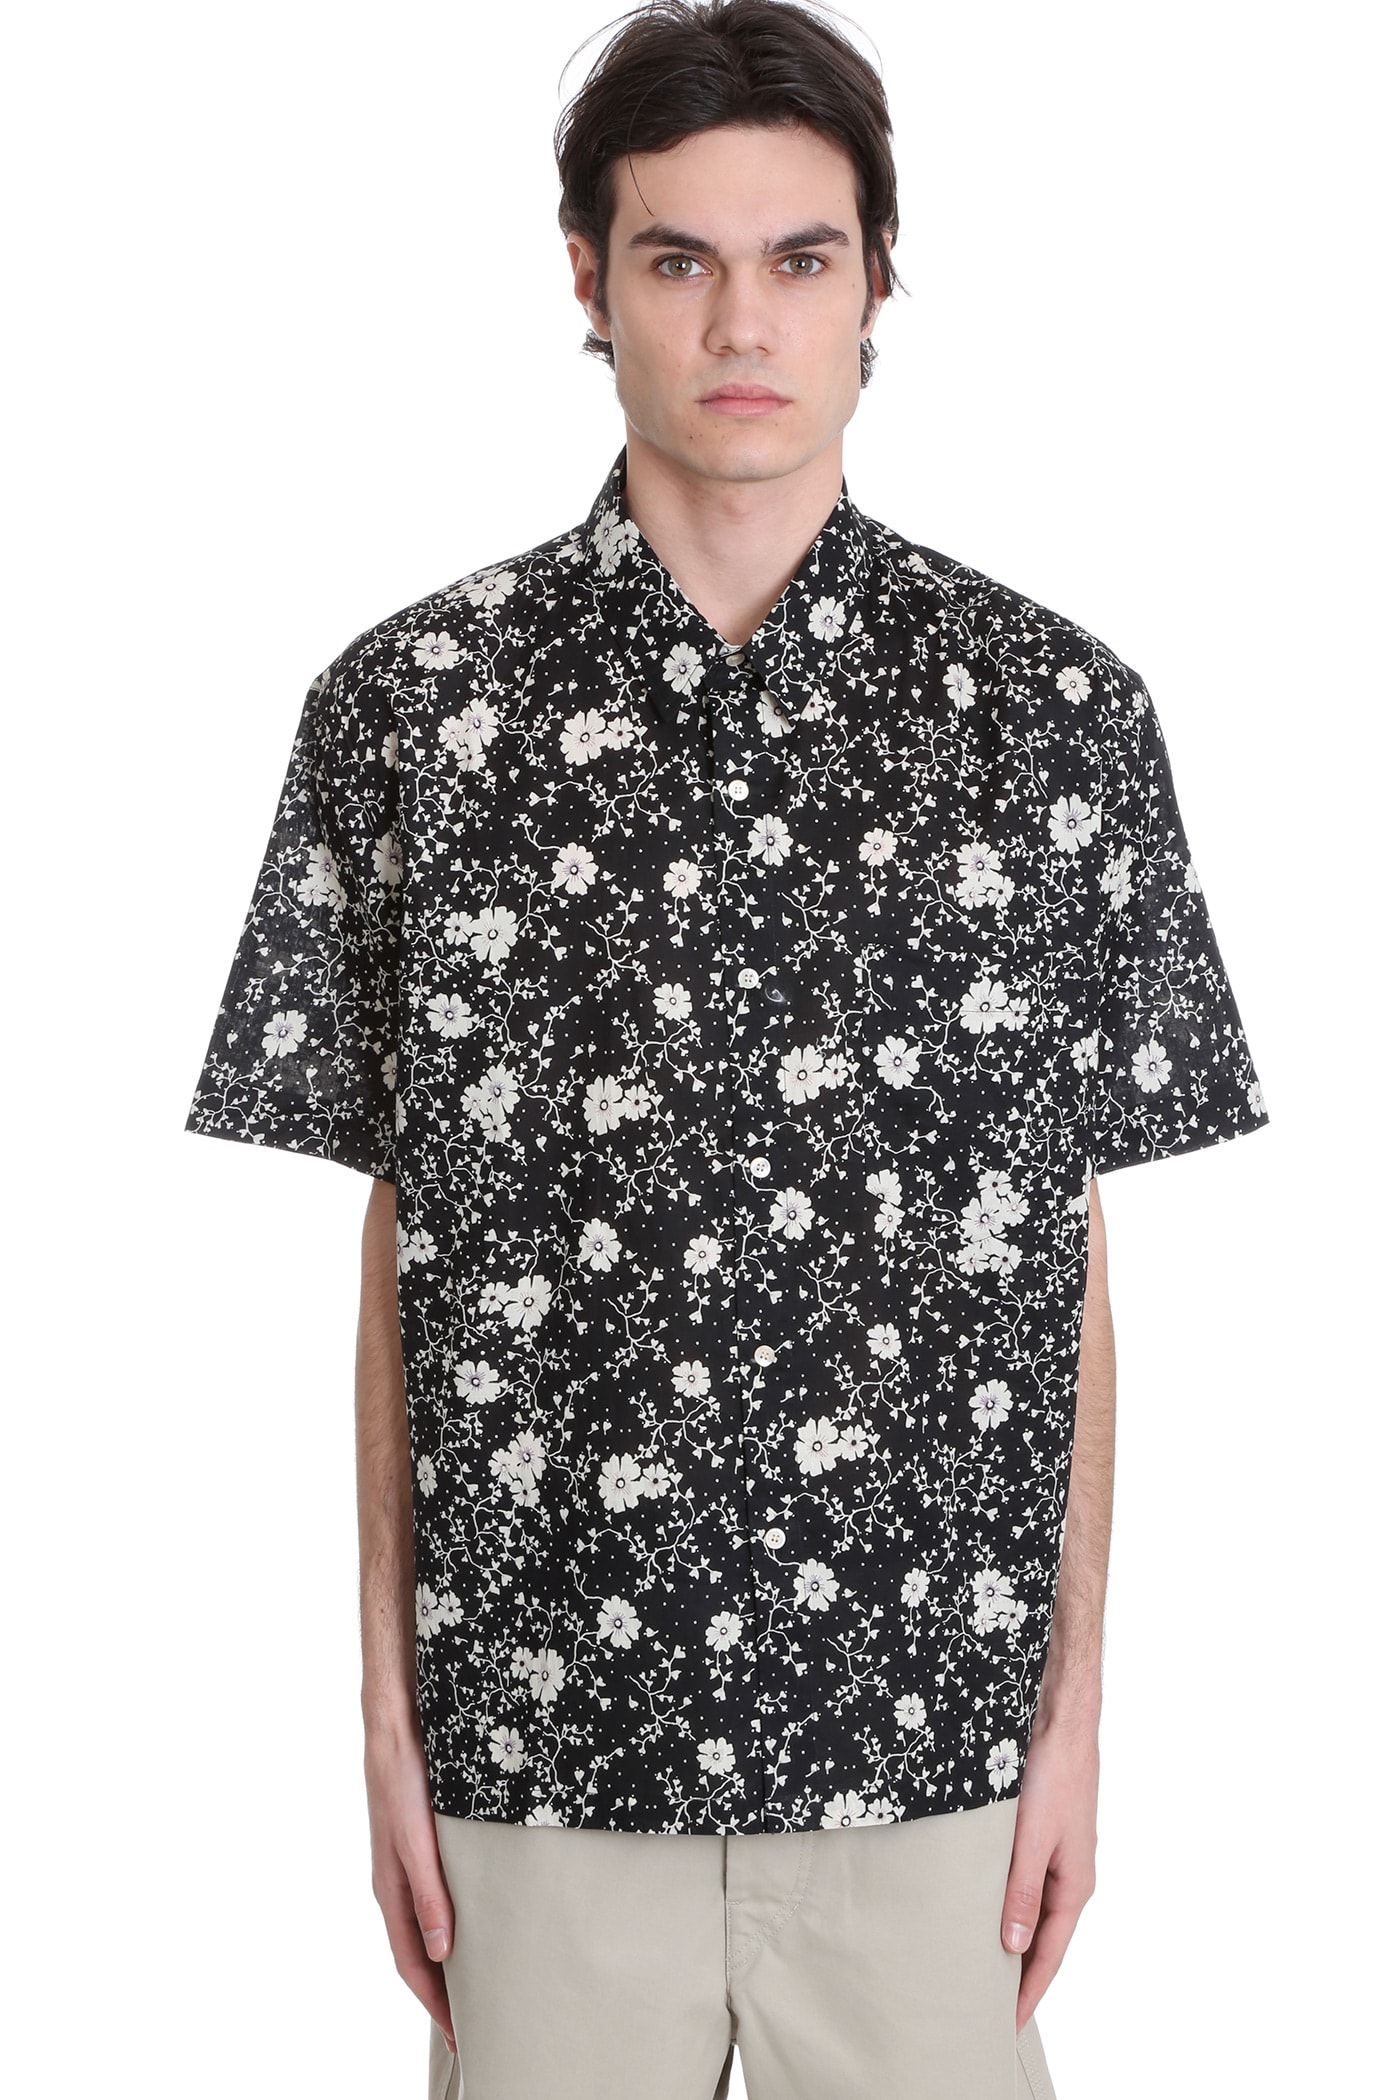 Isabel Marant Shirts IGGY SHIRT IN BLACK COTTON